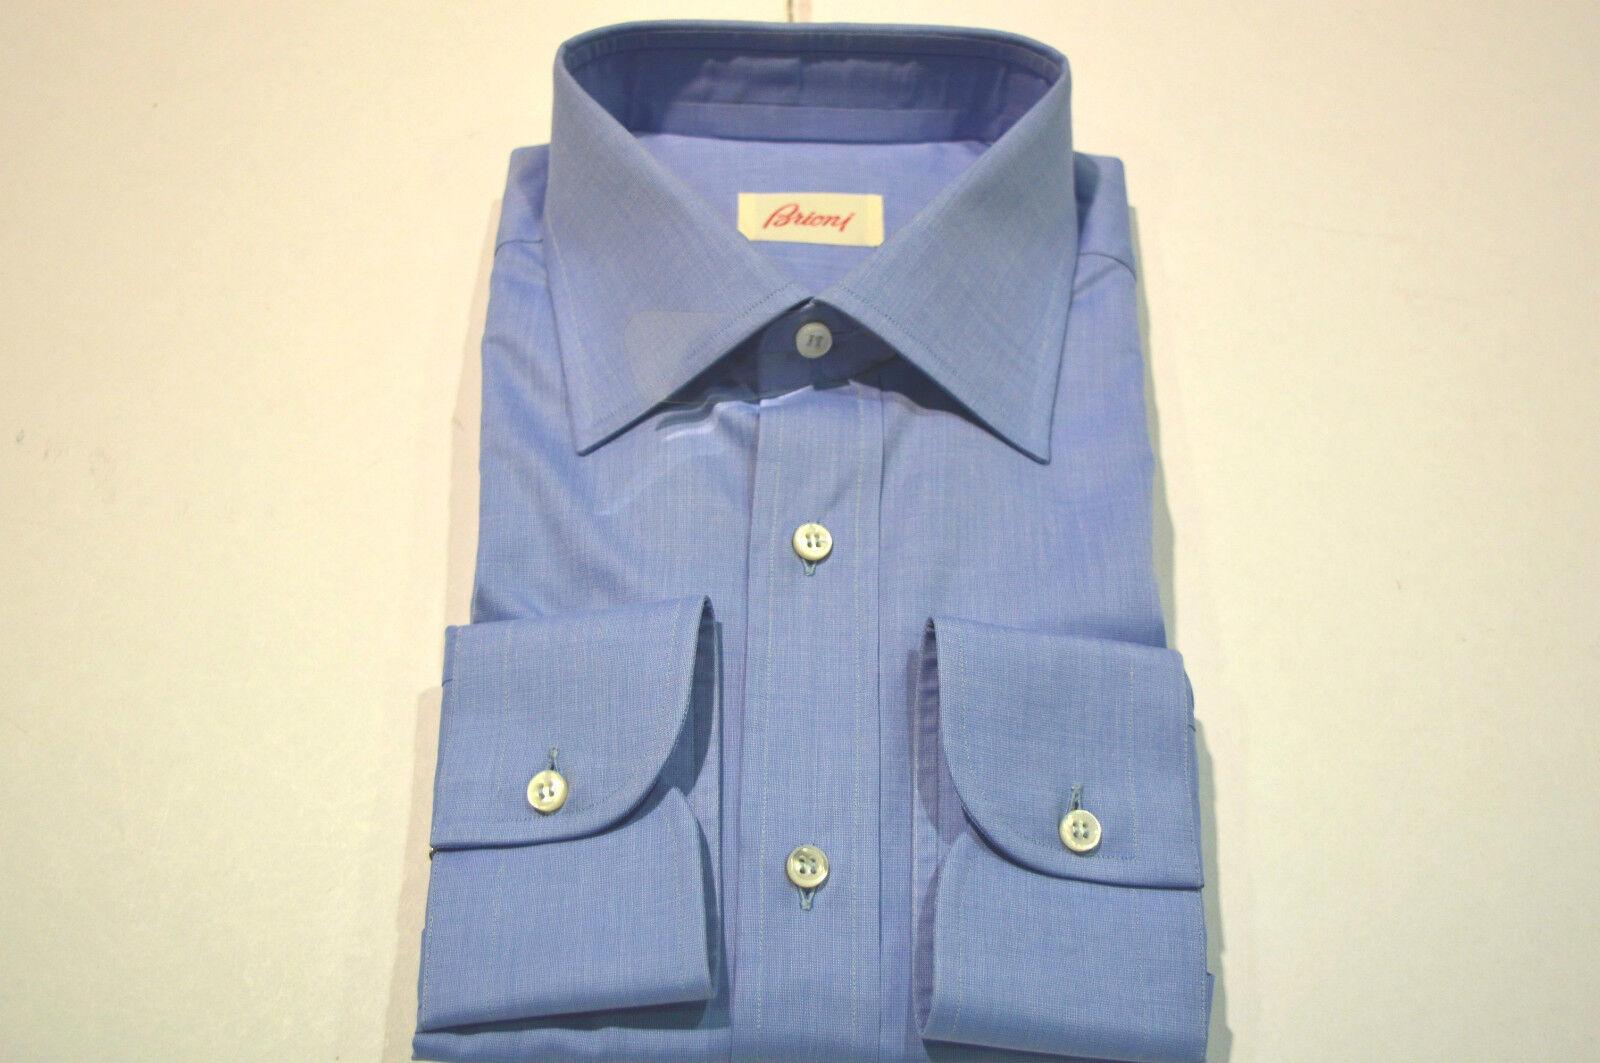 NEW  BRIONI Dress Shirt 100% Cotton Größe 15.75 Us 40  Eu (Cod SG 9)